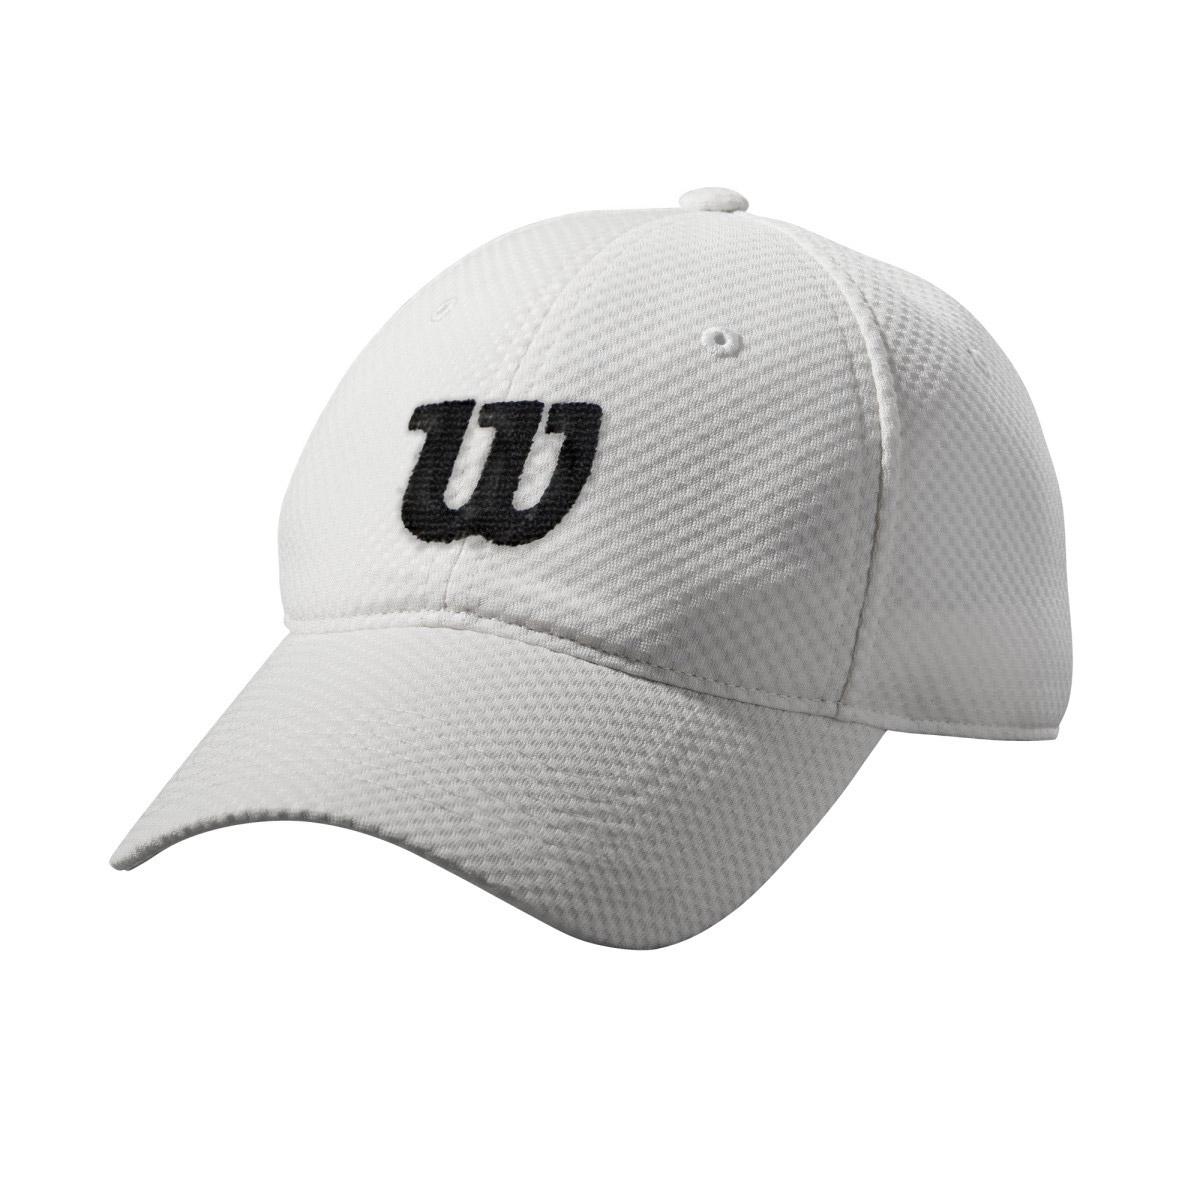 Wilson Summer Cap II - White